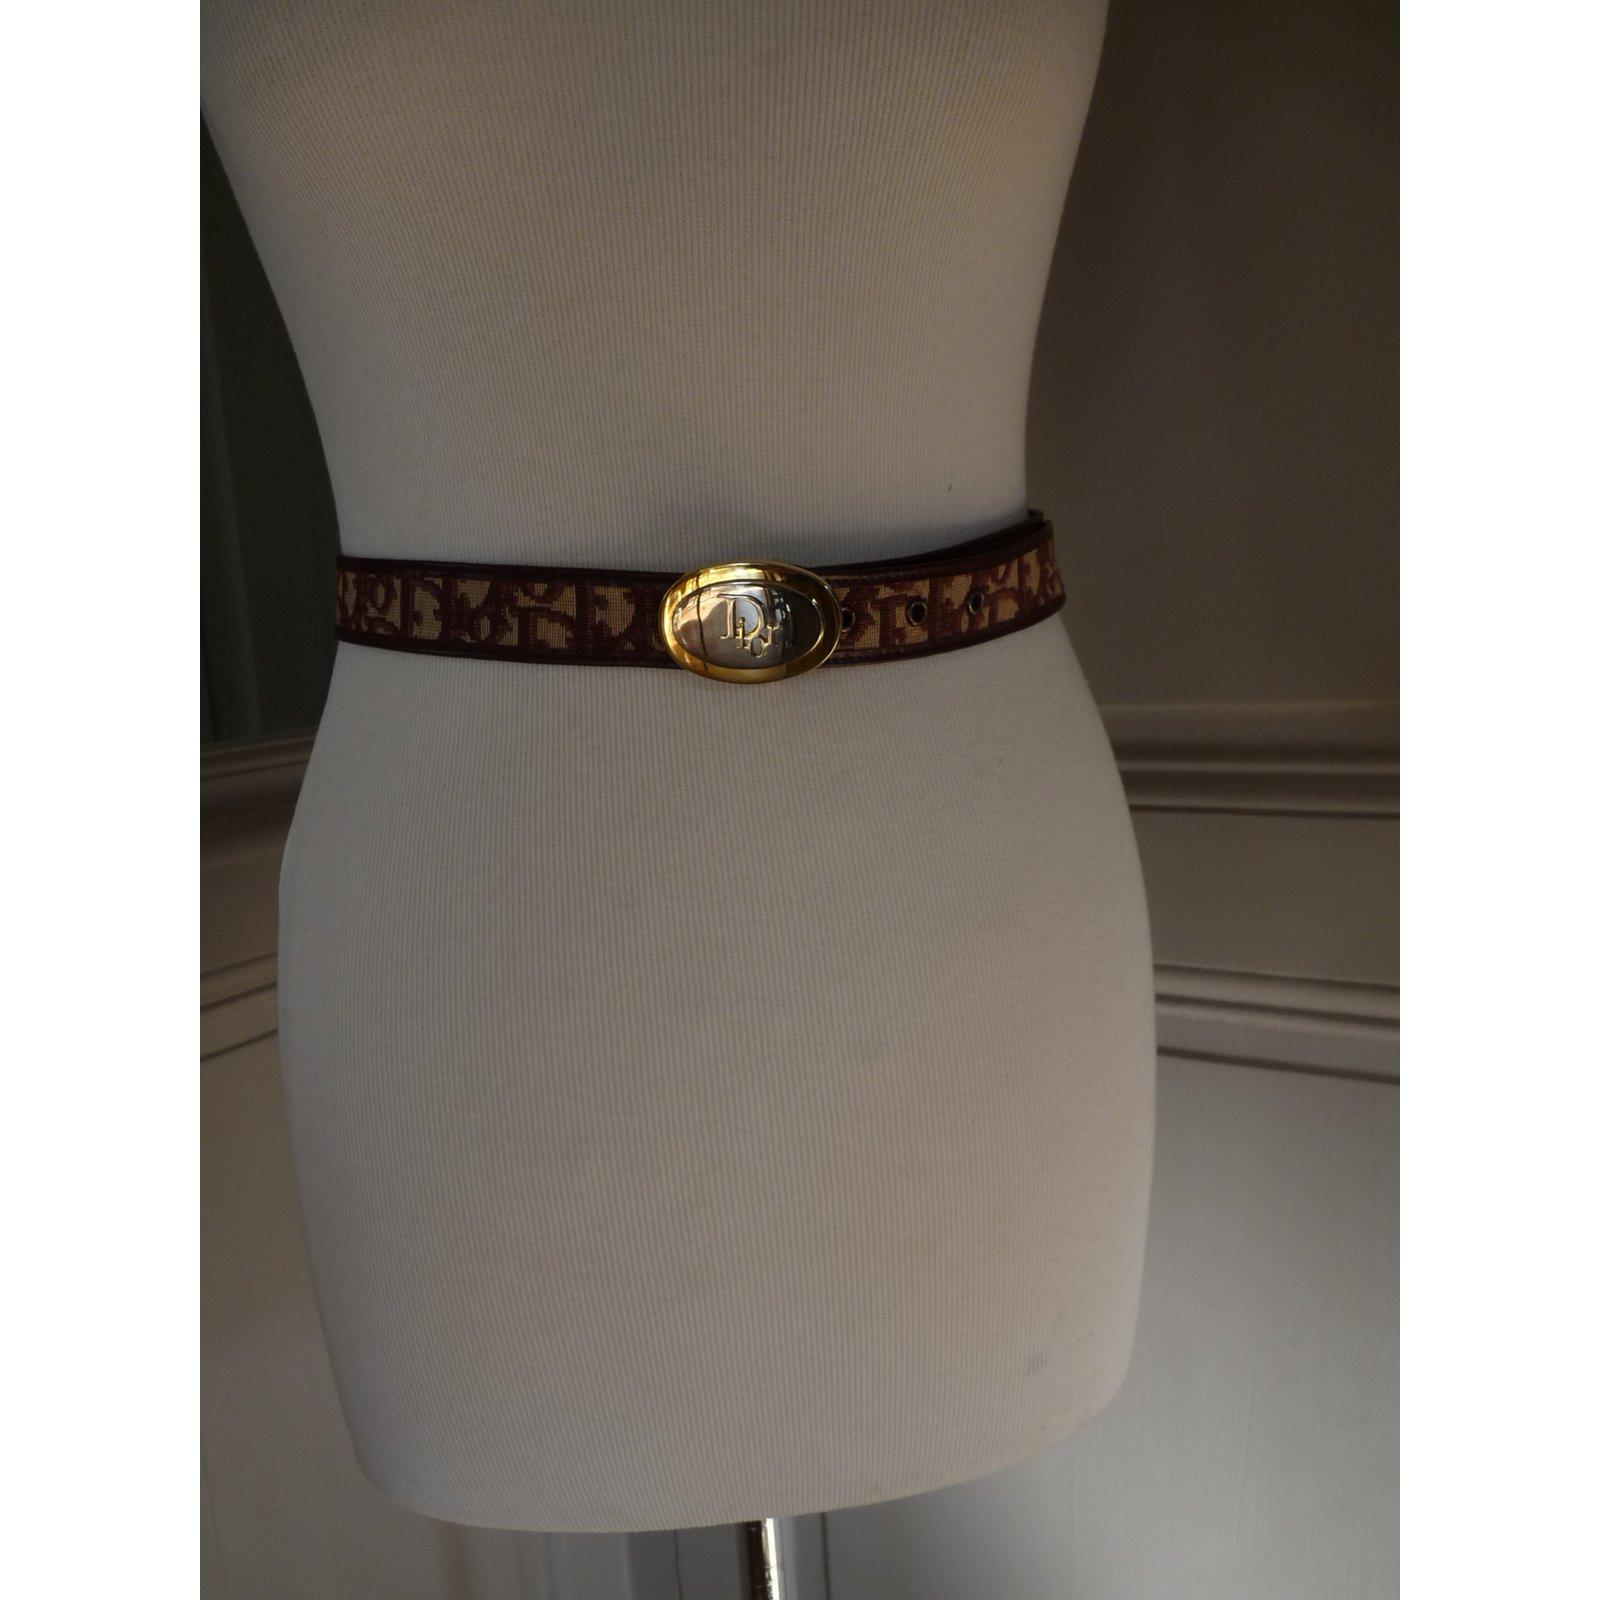 8edf0059d5b Ceintures Christian Dior ceinture monogrammée Toile Bordeaux ref.13672 -  Joli Closet